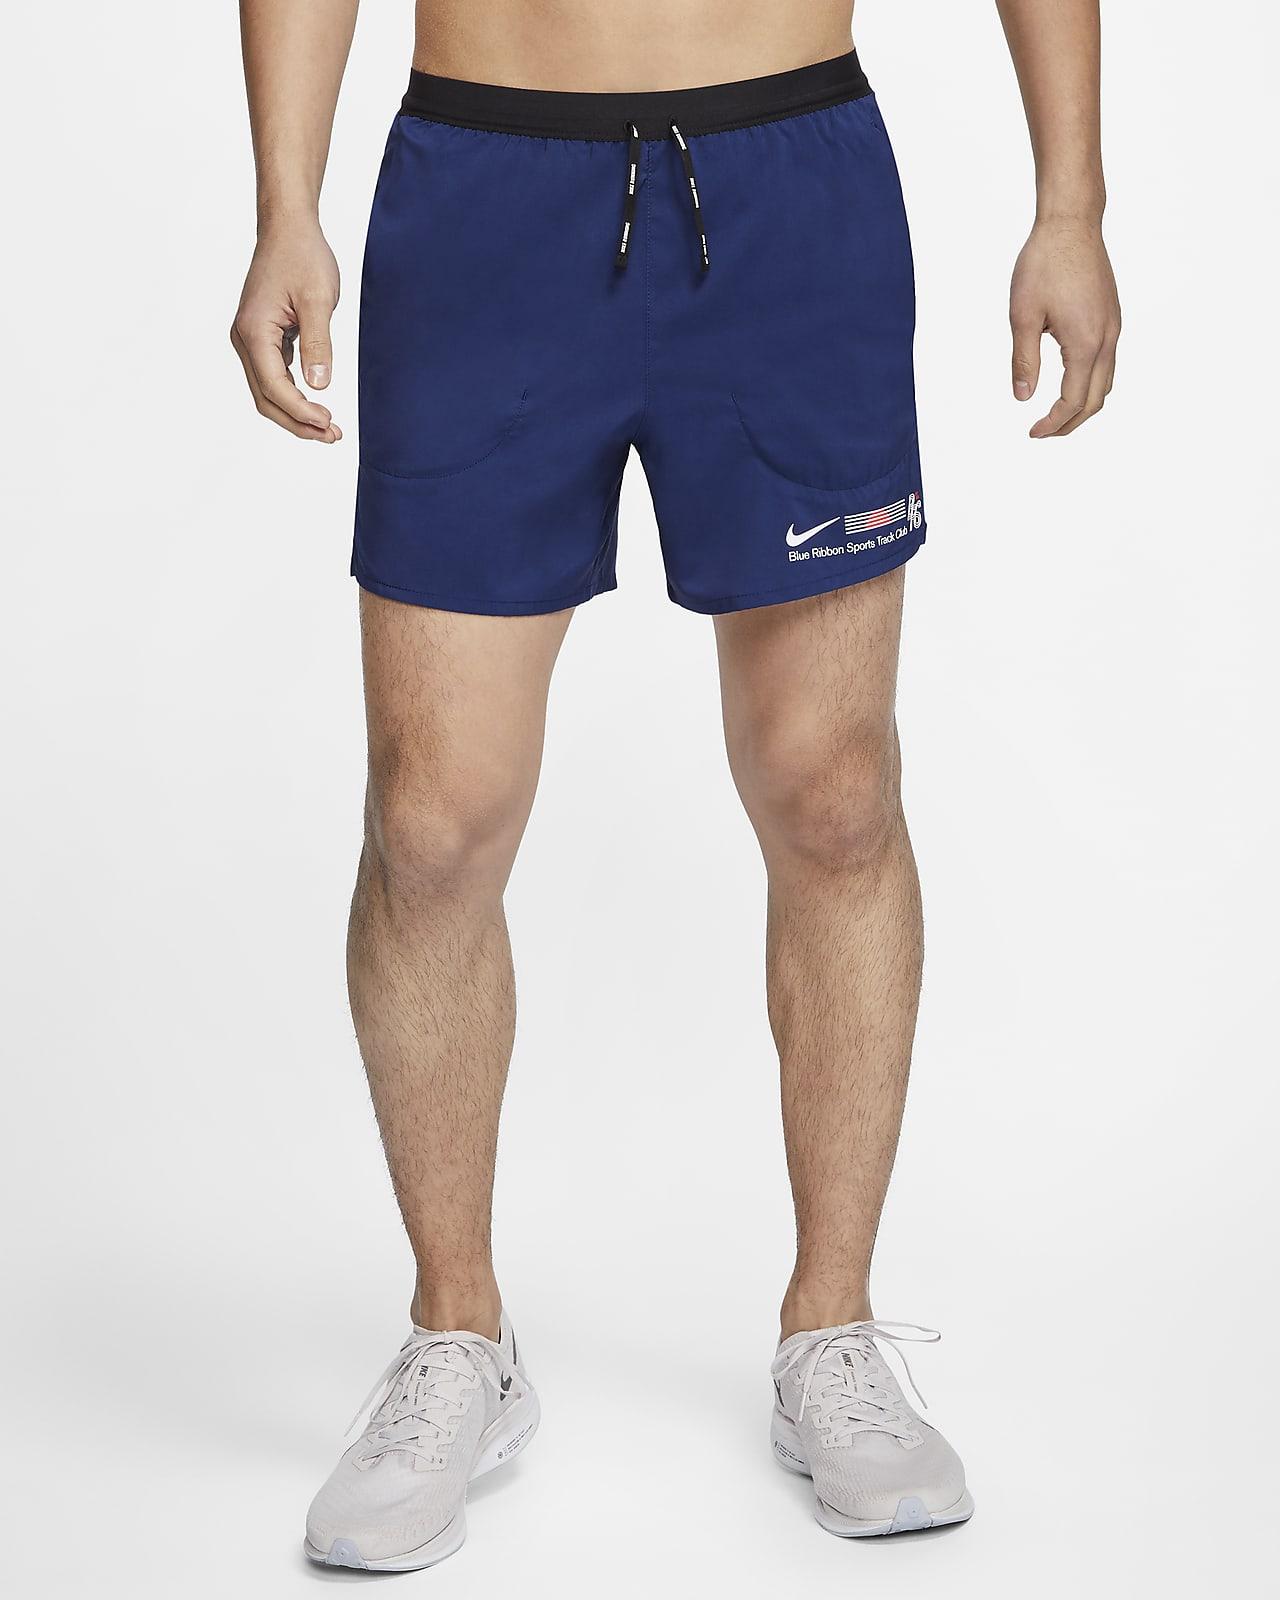 Nike Flex Stride Blue Ribbon Sports Men's 9cm (approx.) Brief-Lined Running Shorts